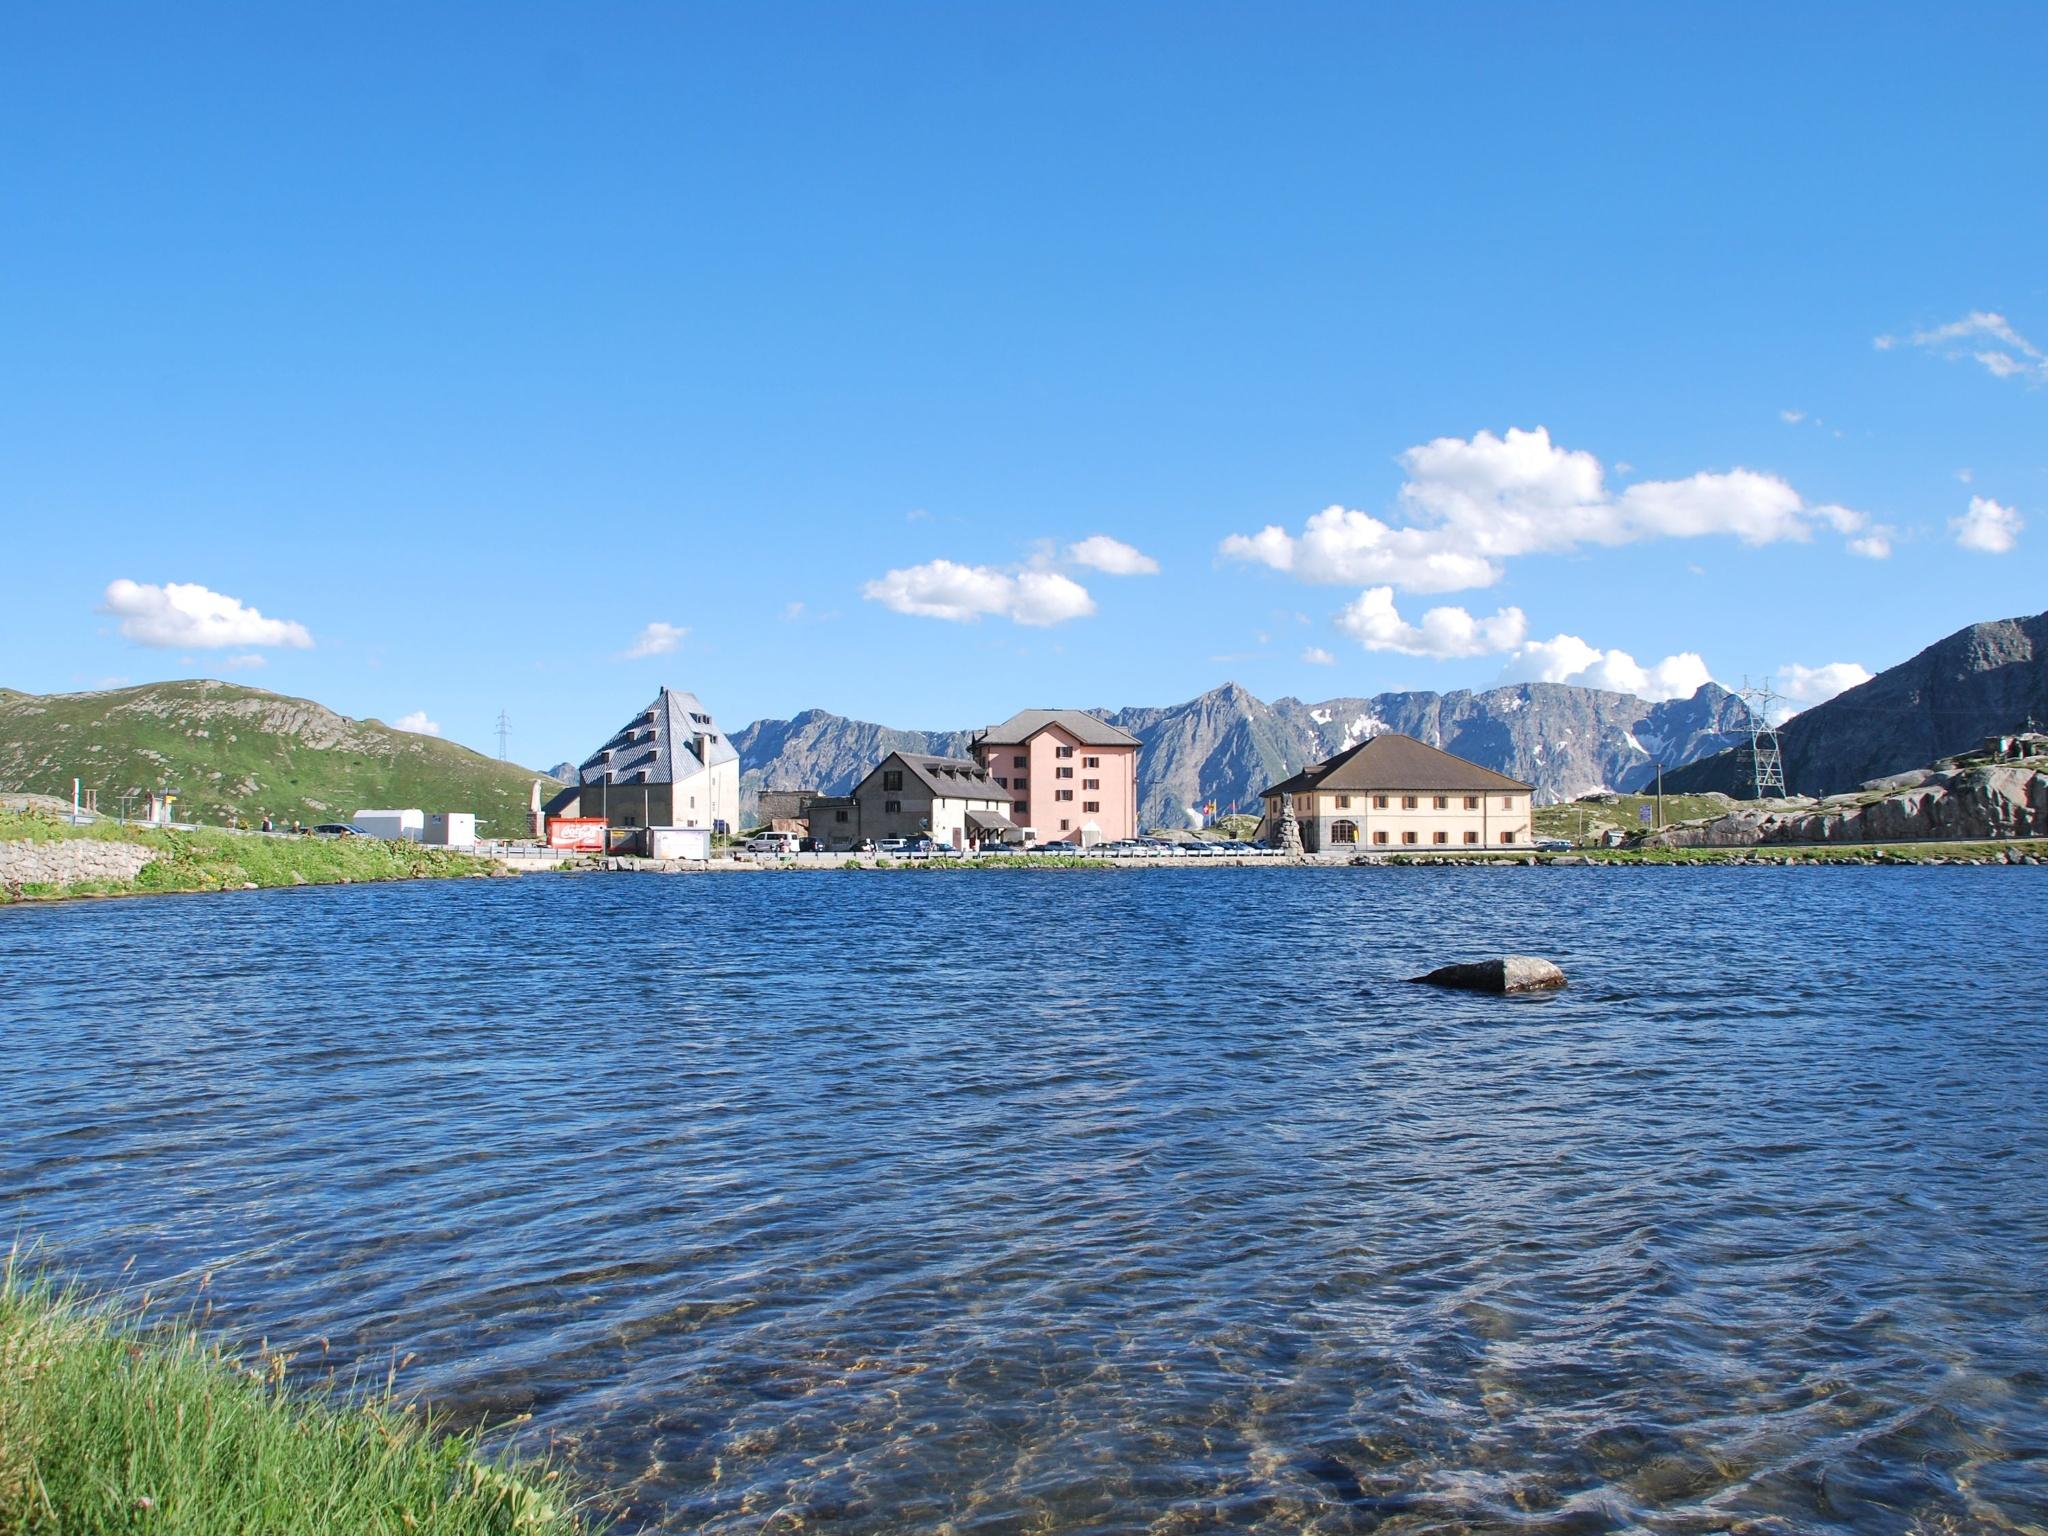 Gotthardpasshöhe